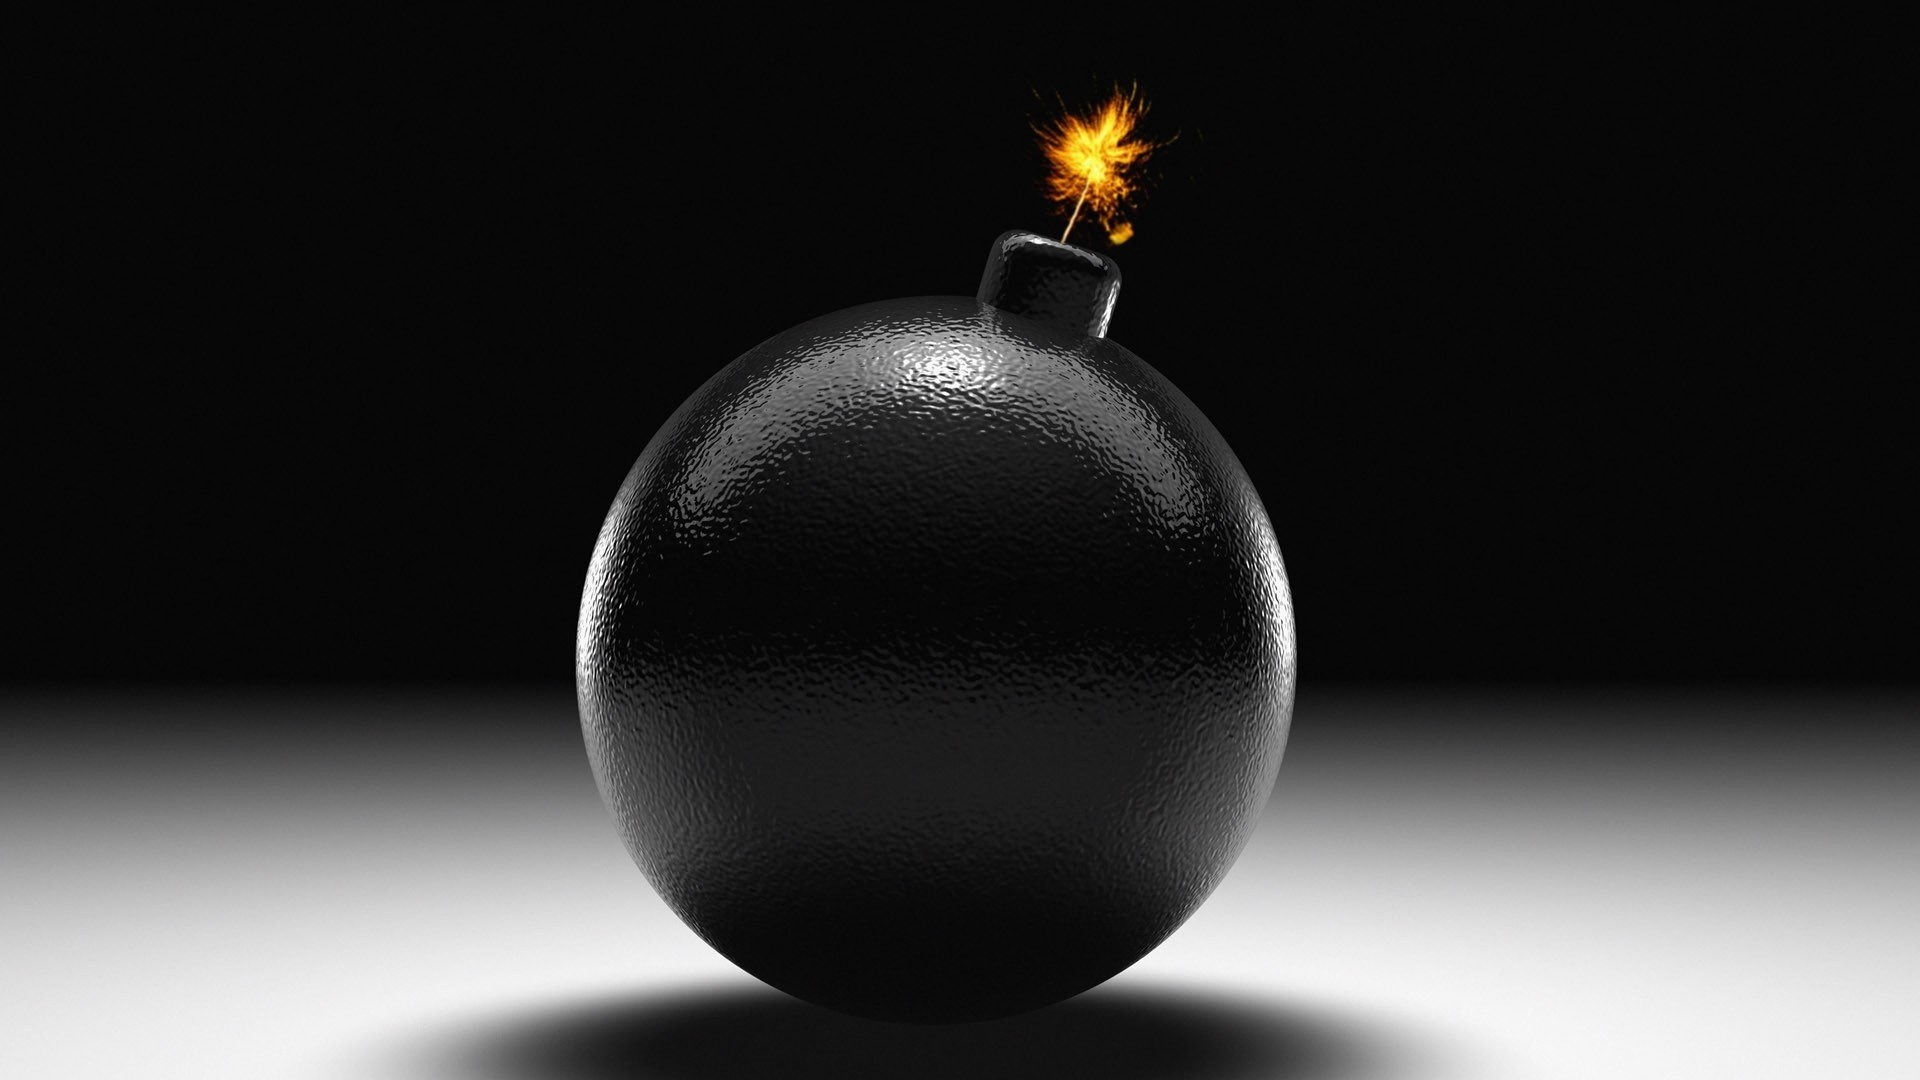 bomb, explosion, black